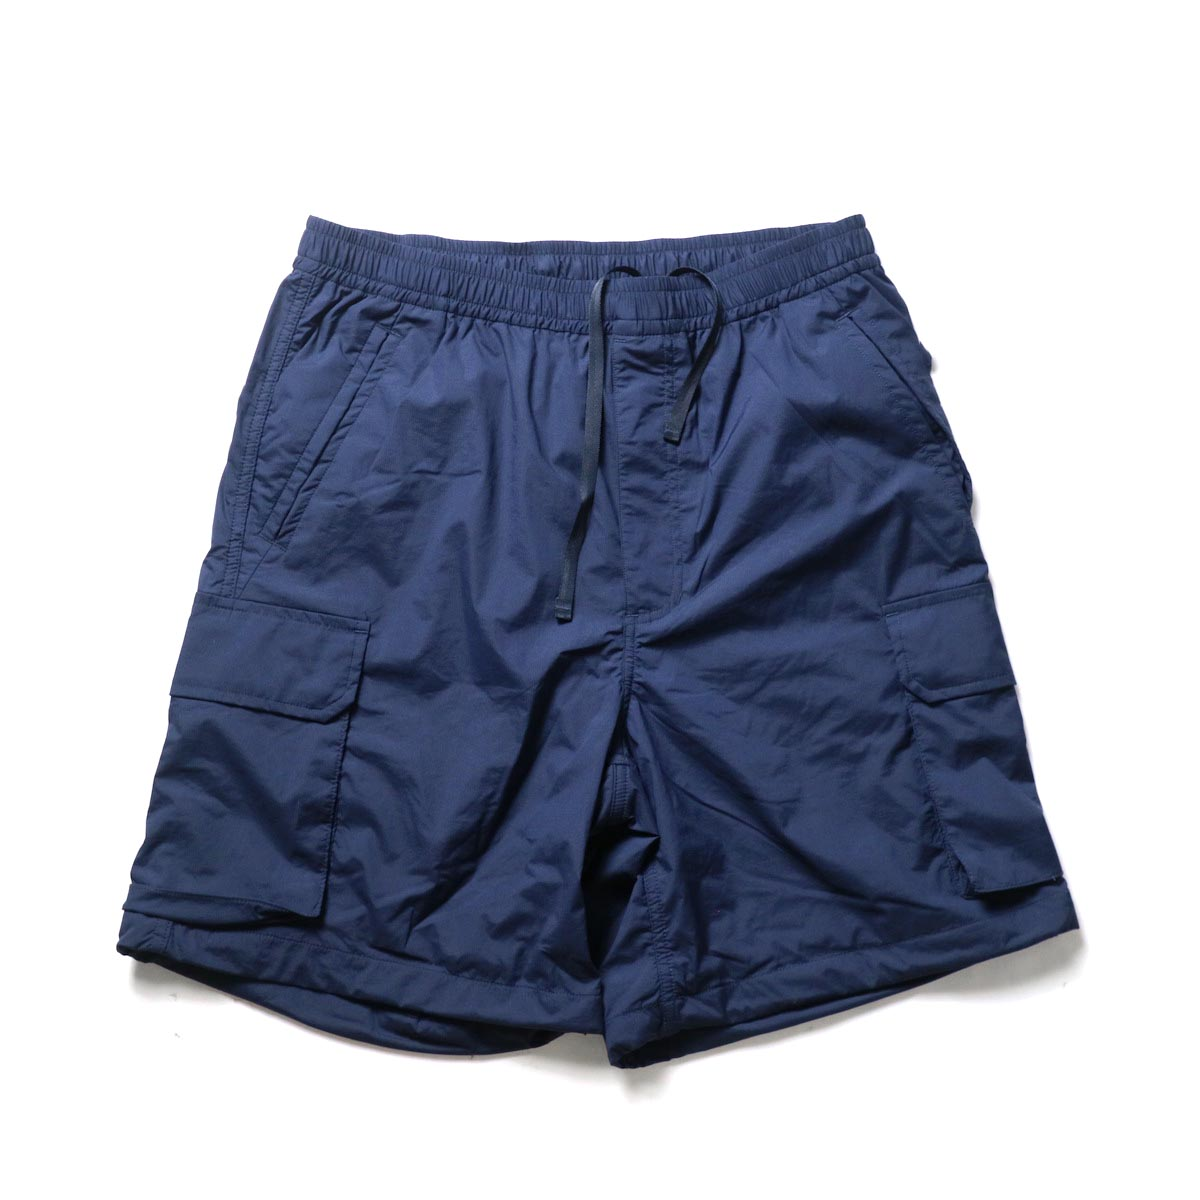 DAIWA PIER39 / Tech French Mil Field Shorts (Navy)